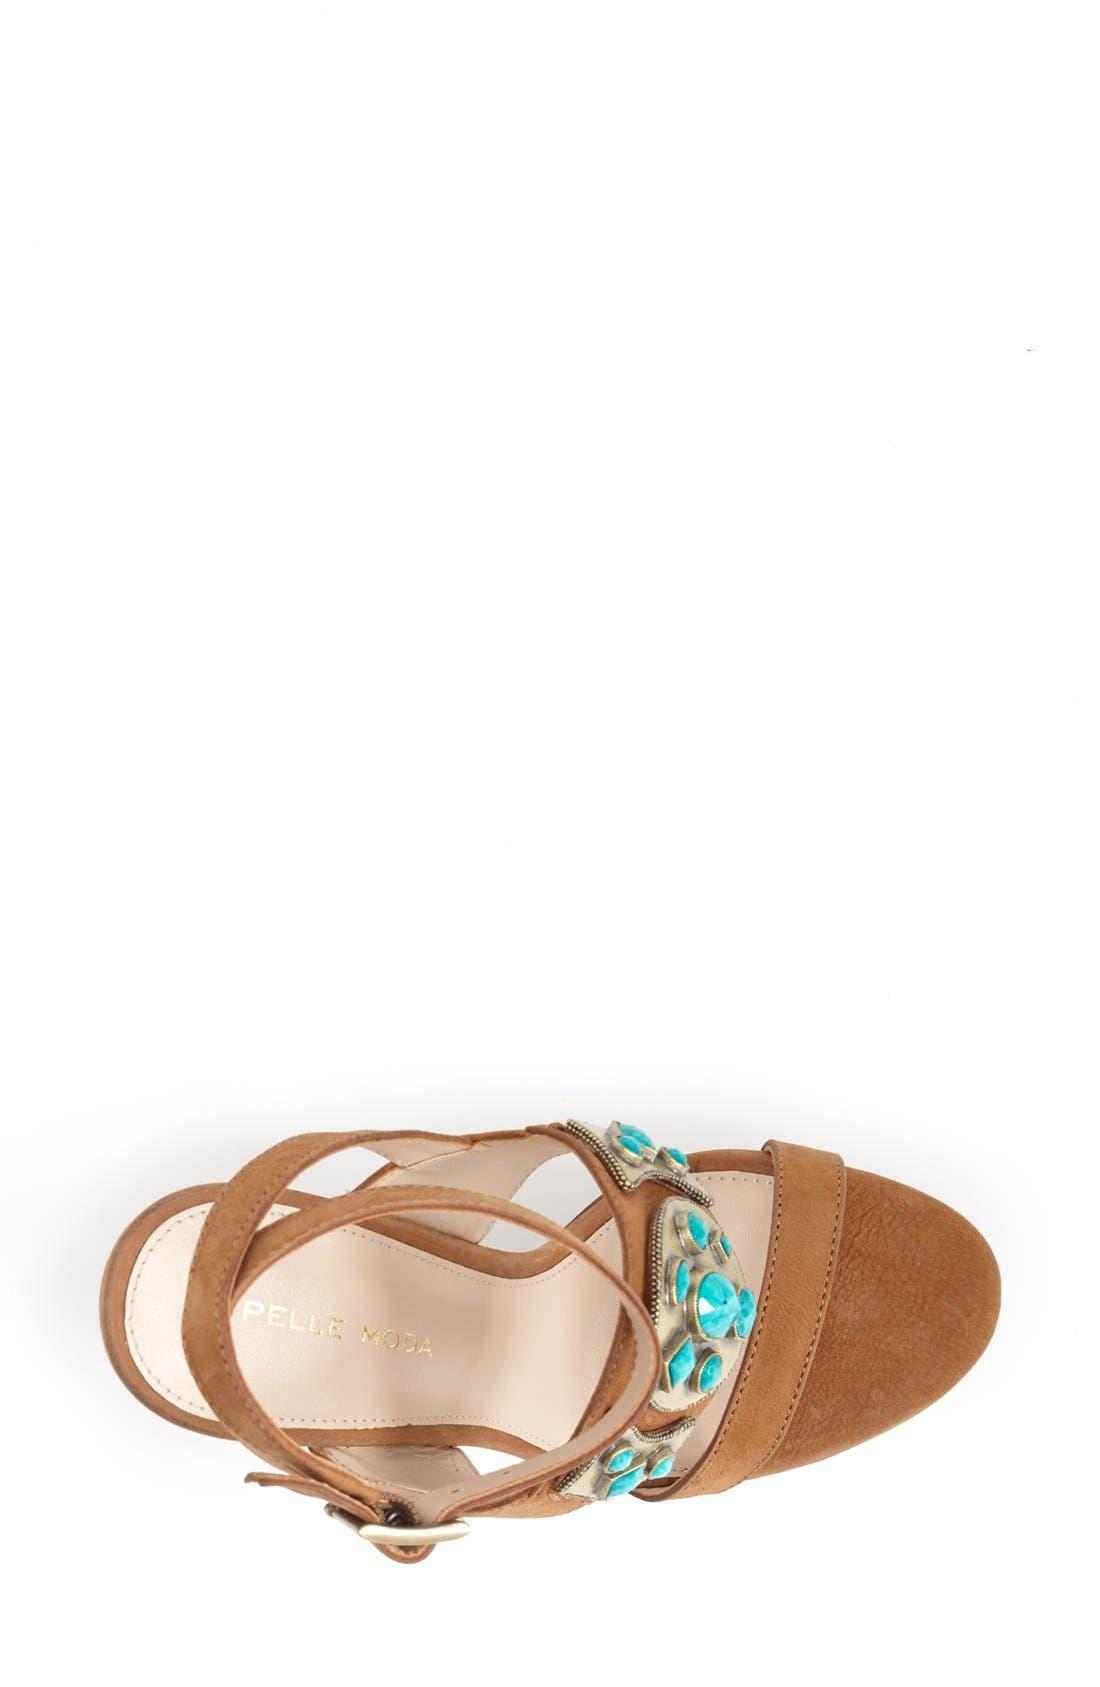 Alternate Image 3  - Pelle Moda 'Cian' Jeweled Leather Ankle Strap Platform Sandal (Women)